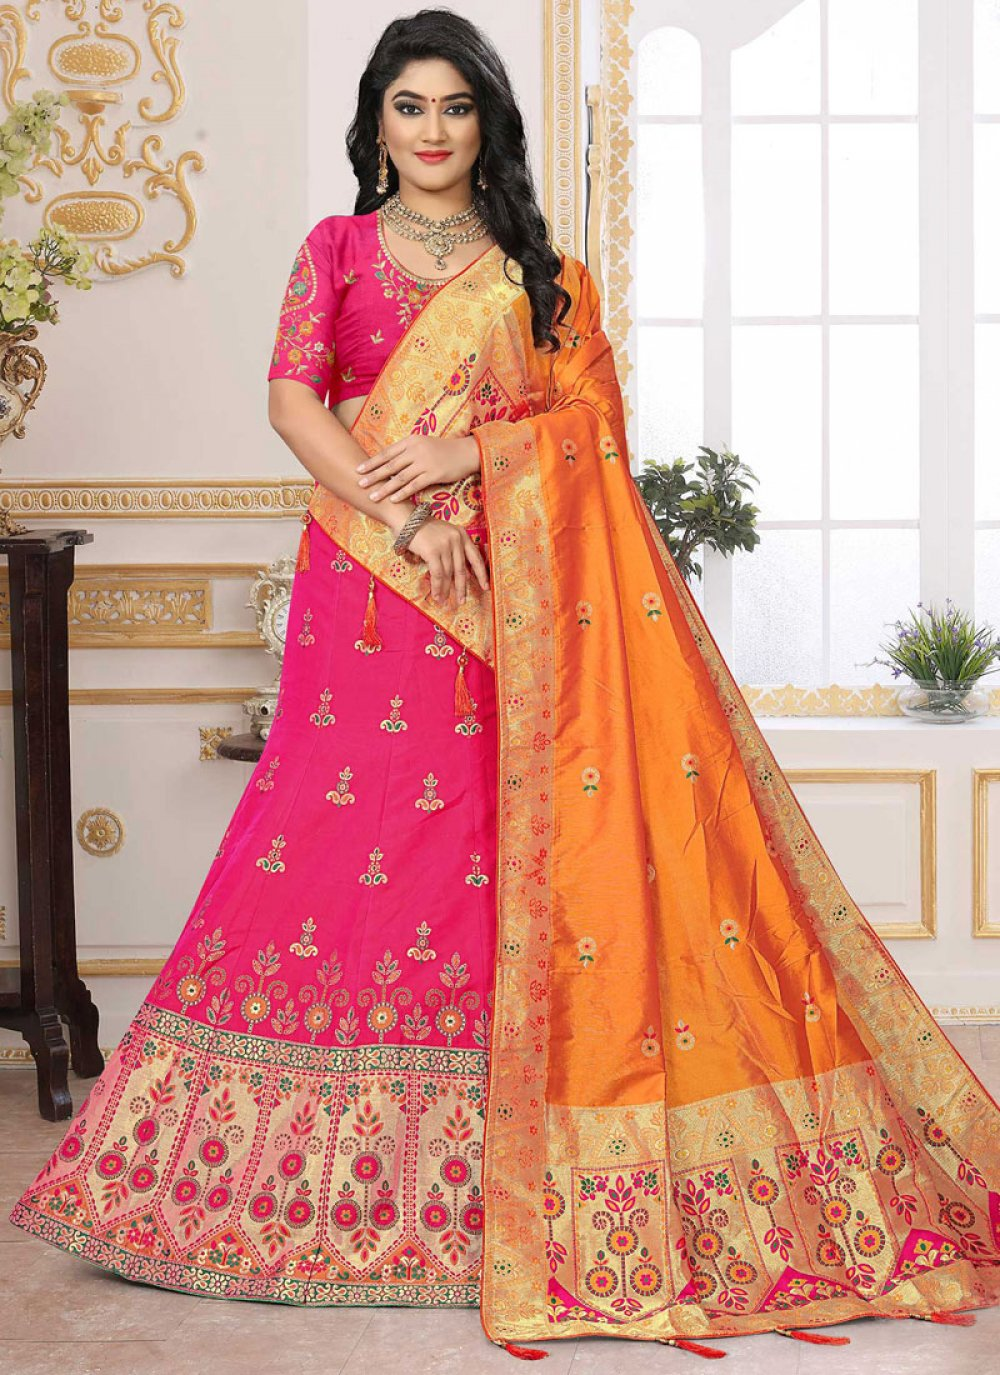 Hot Pink Silk Embroidered Designer Lehenga Choli